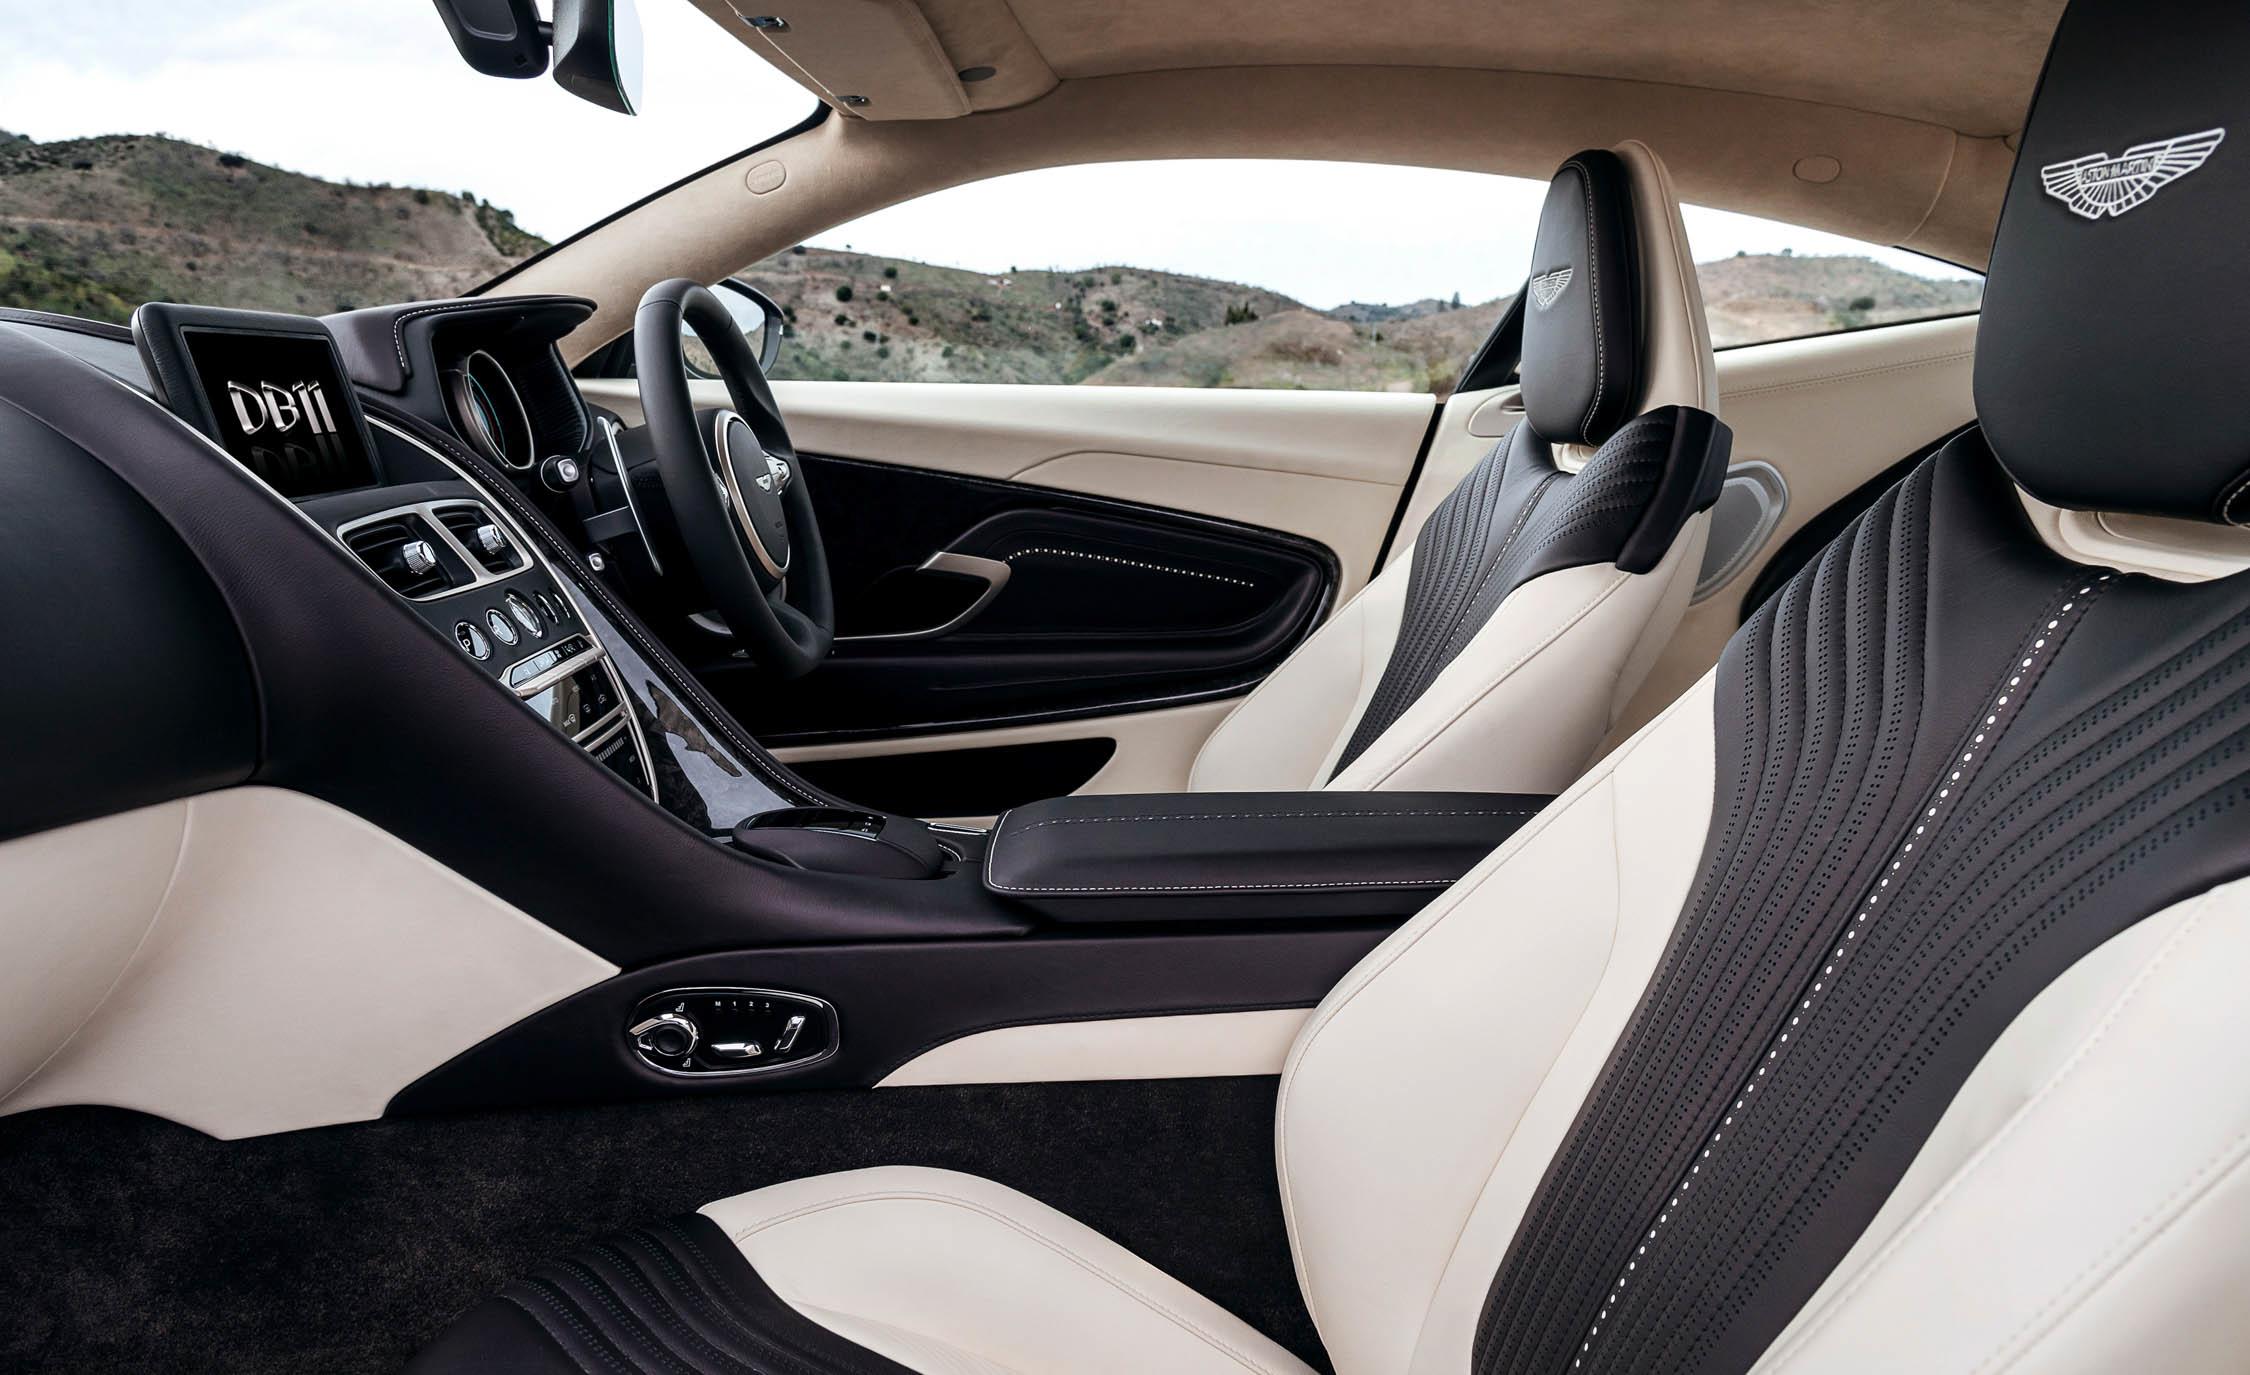 2017 Aston Martin Db11 Interior Seats (View 15 of 22)